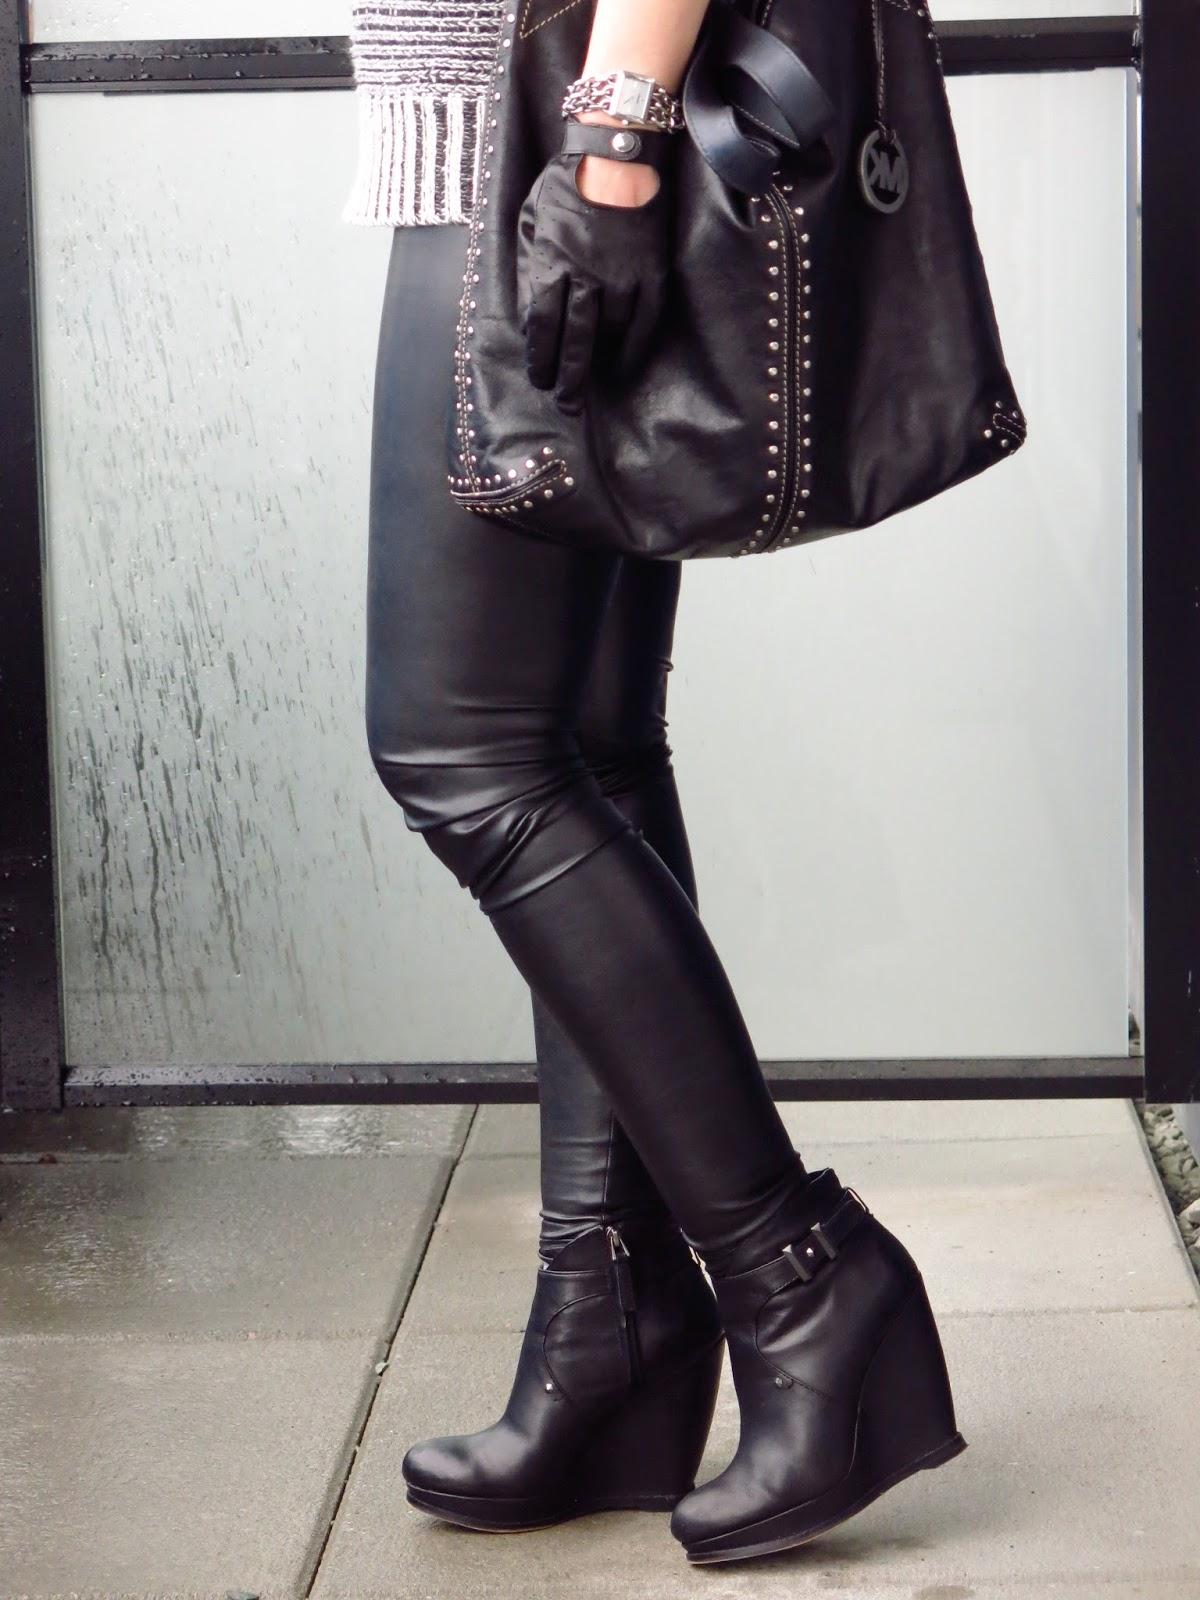 vegan leather leggings, wedge booties, Michael Kors bag, driving gloves